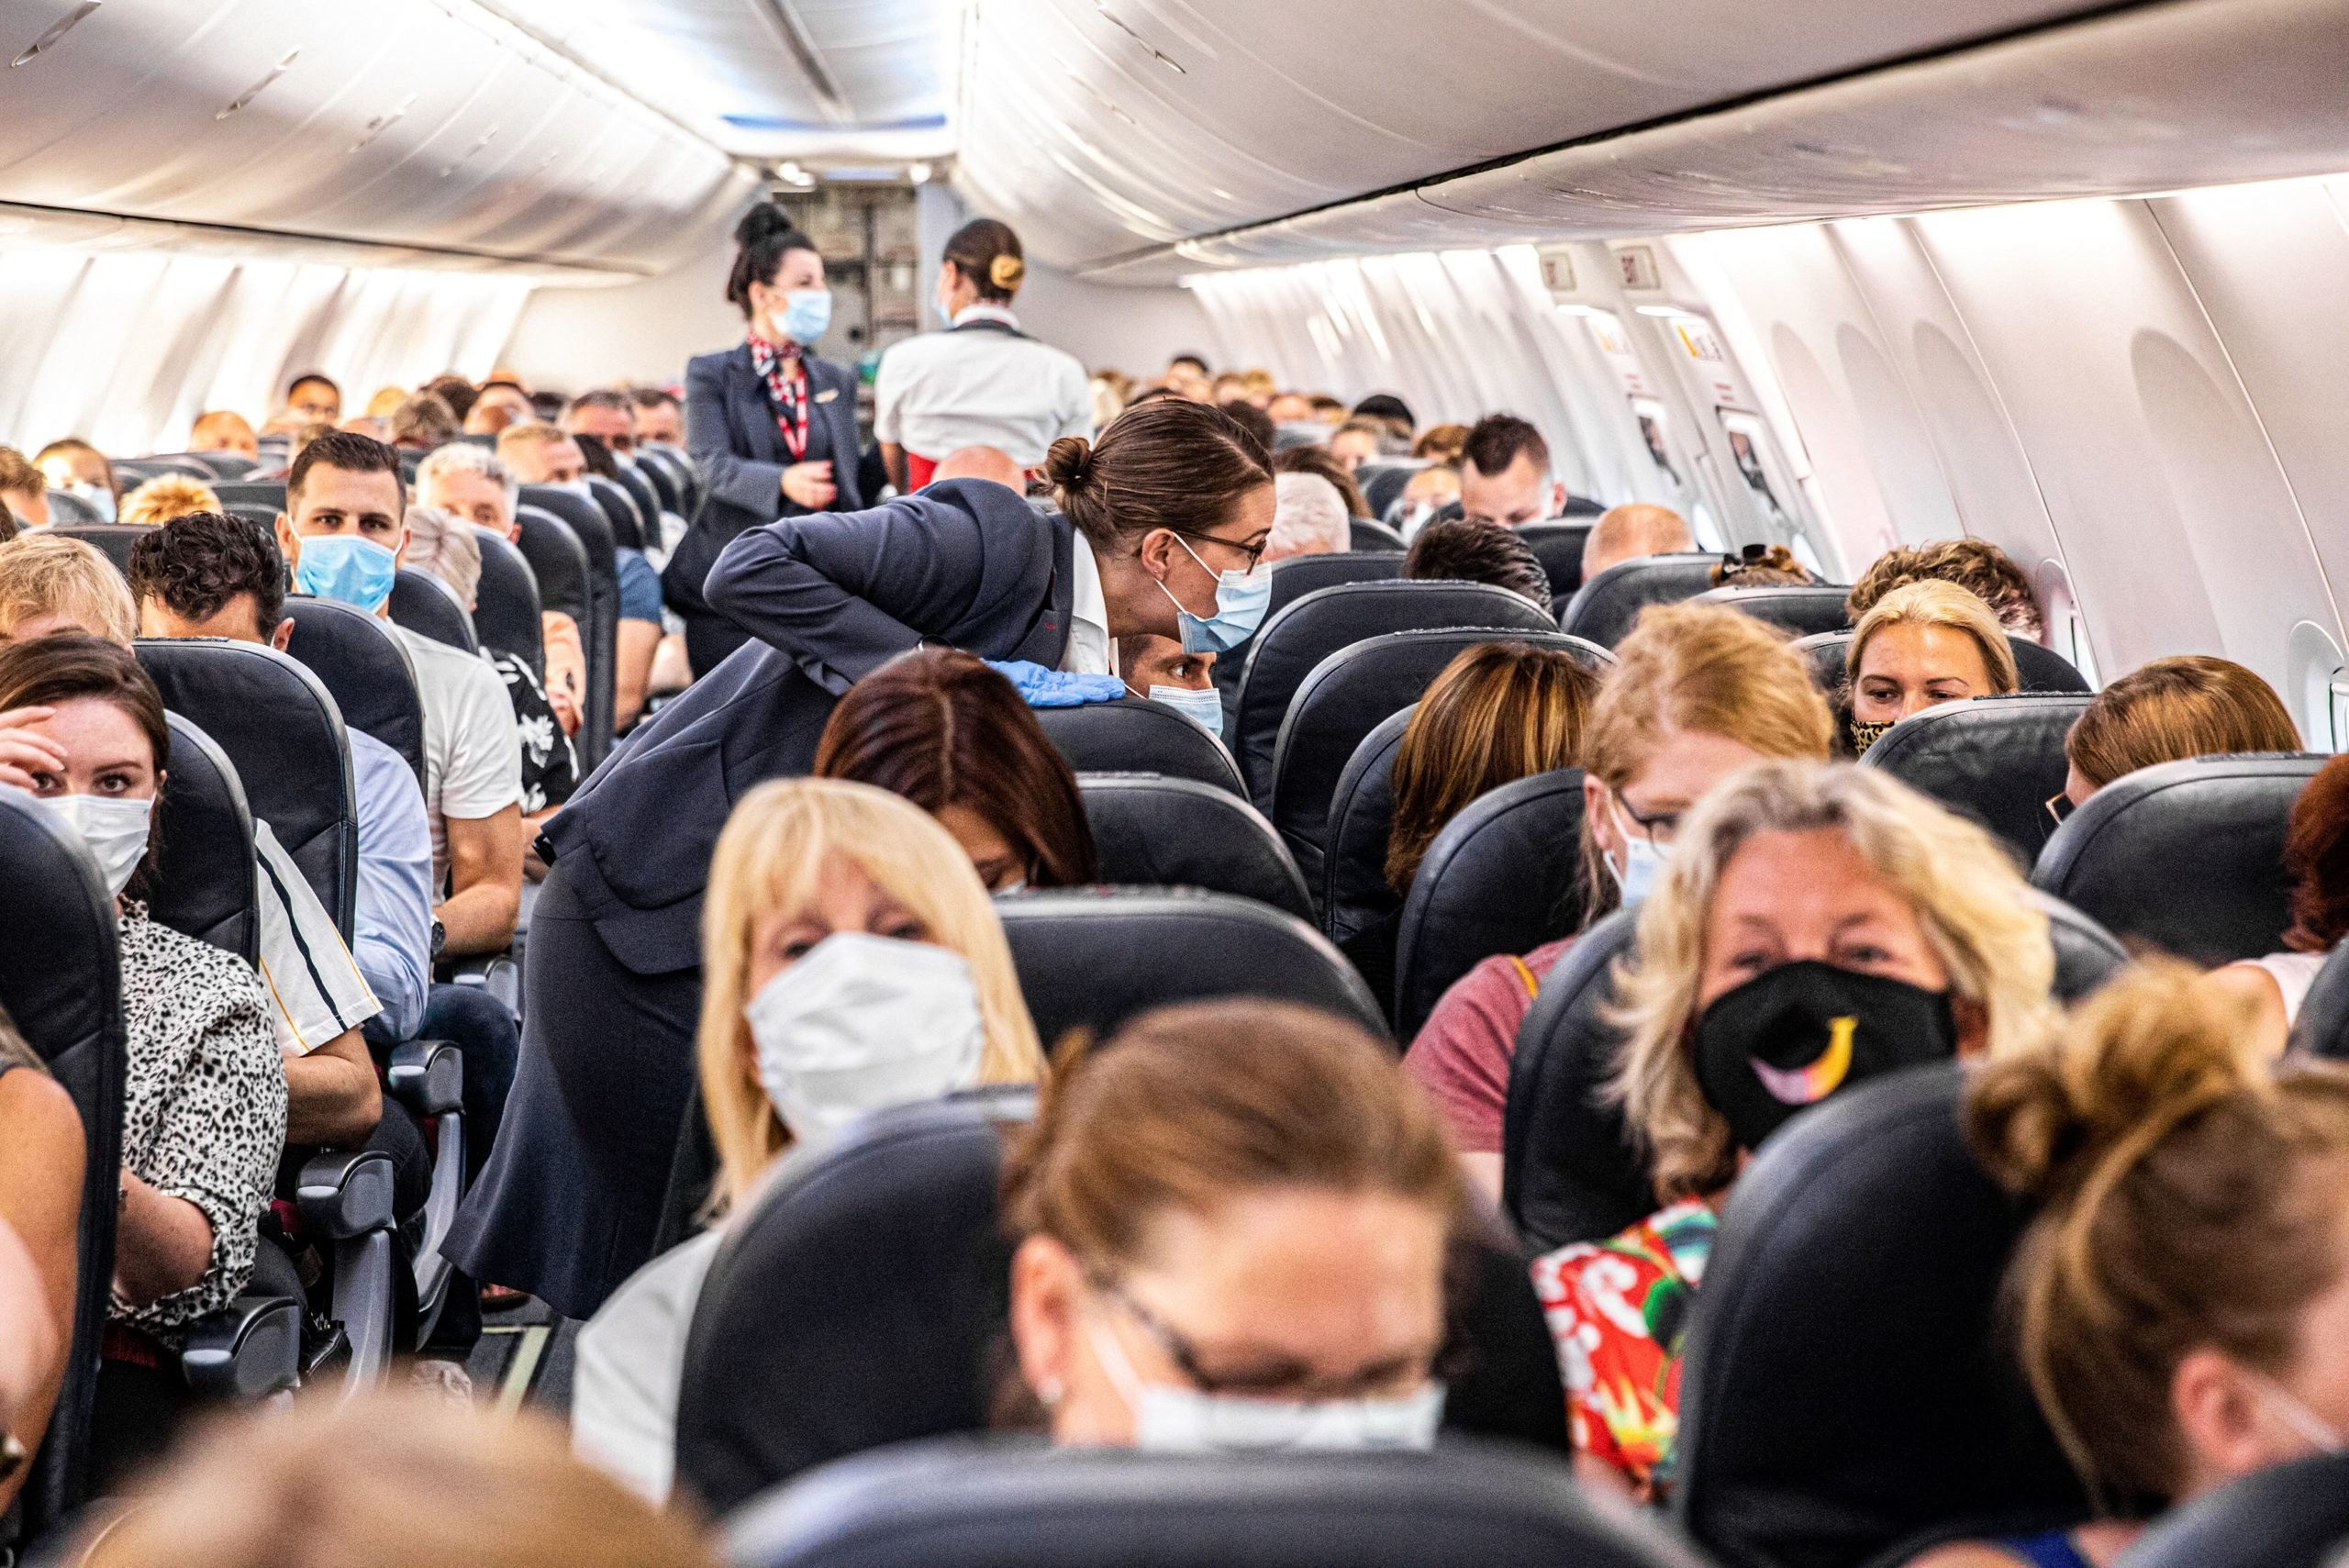 NETHERLANDS-TRAVEL-AIRPORT